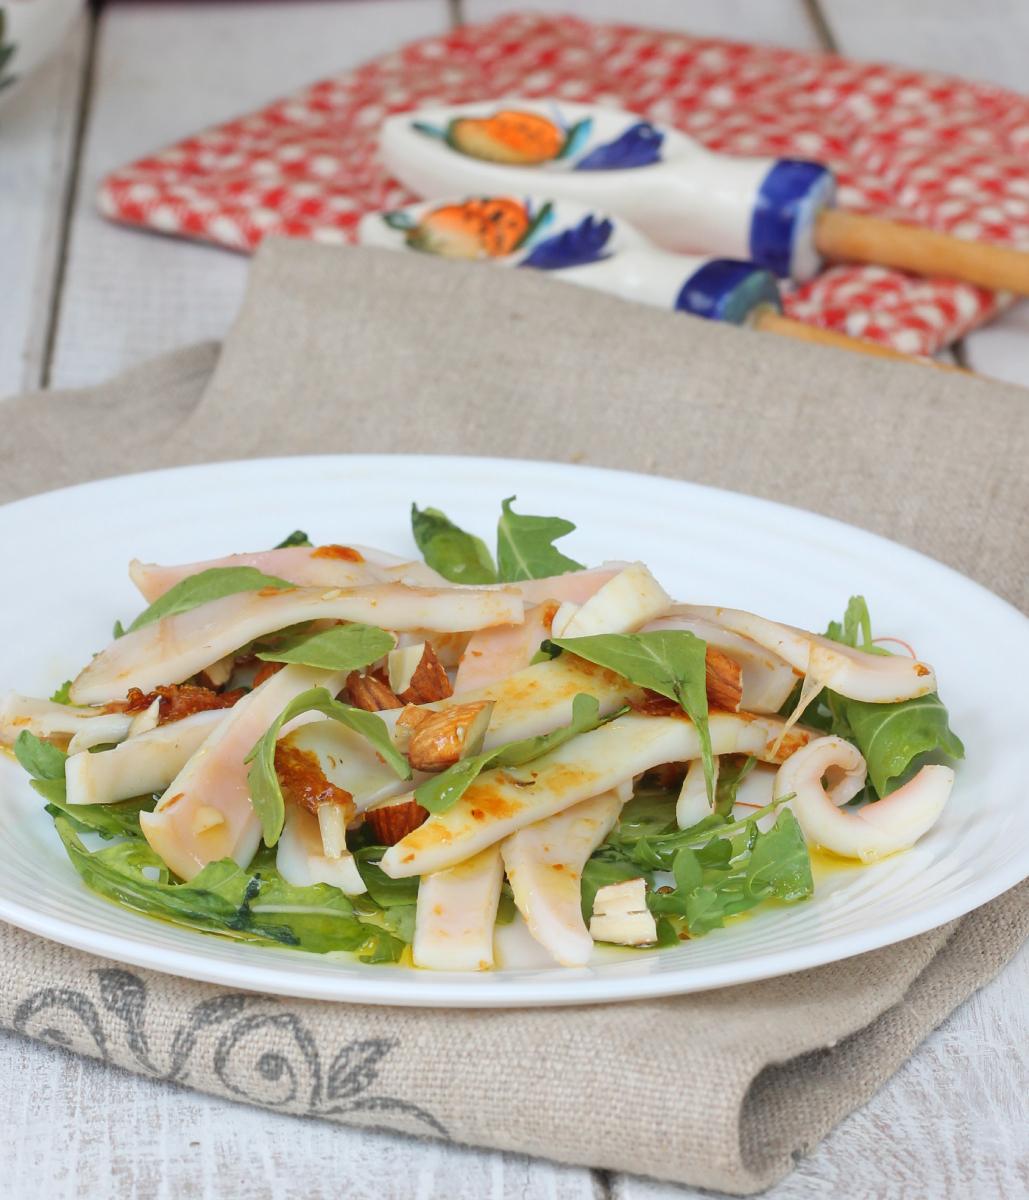 INSALATA CALAMARI ricetta calamari in insalata di rucola e mandorle